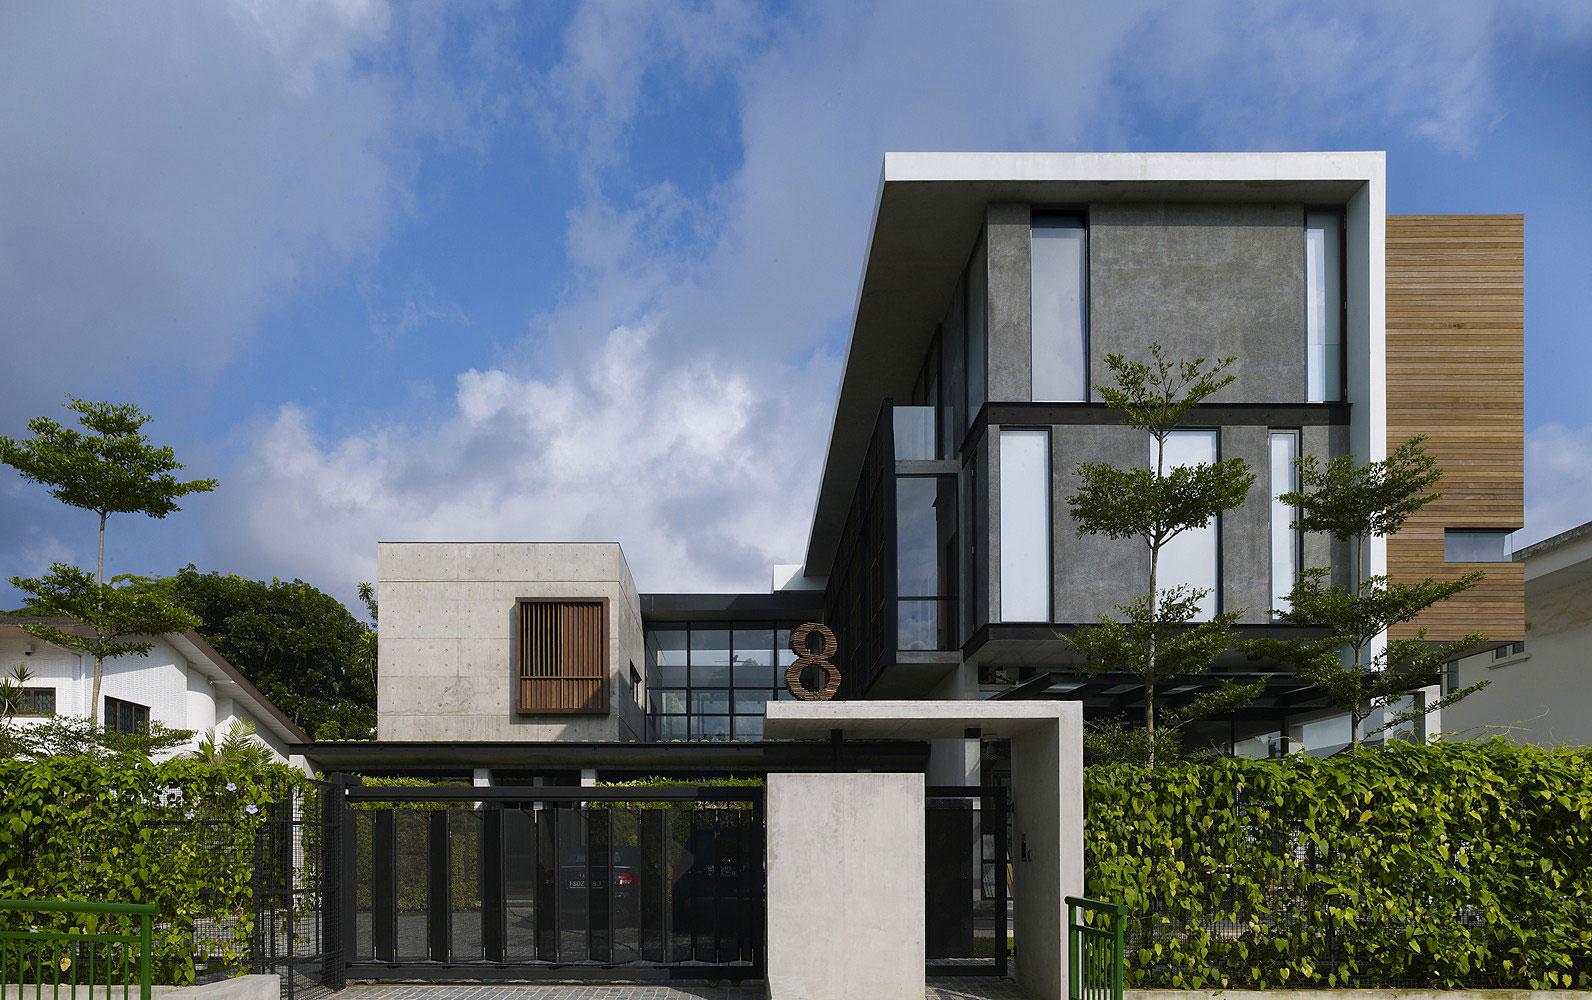 Večstanovanjska hiša, vir: http://www.davidrennert.com